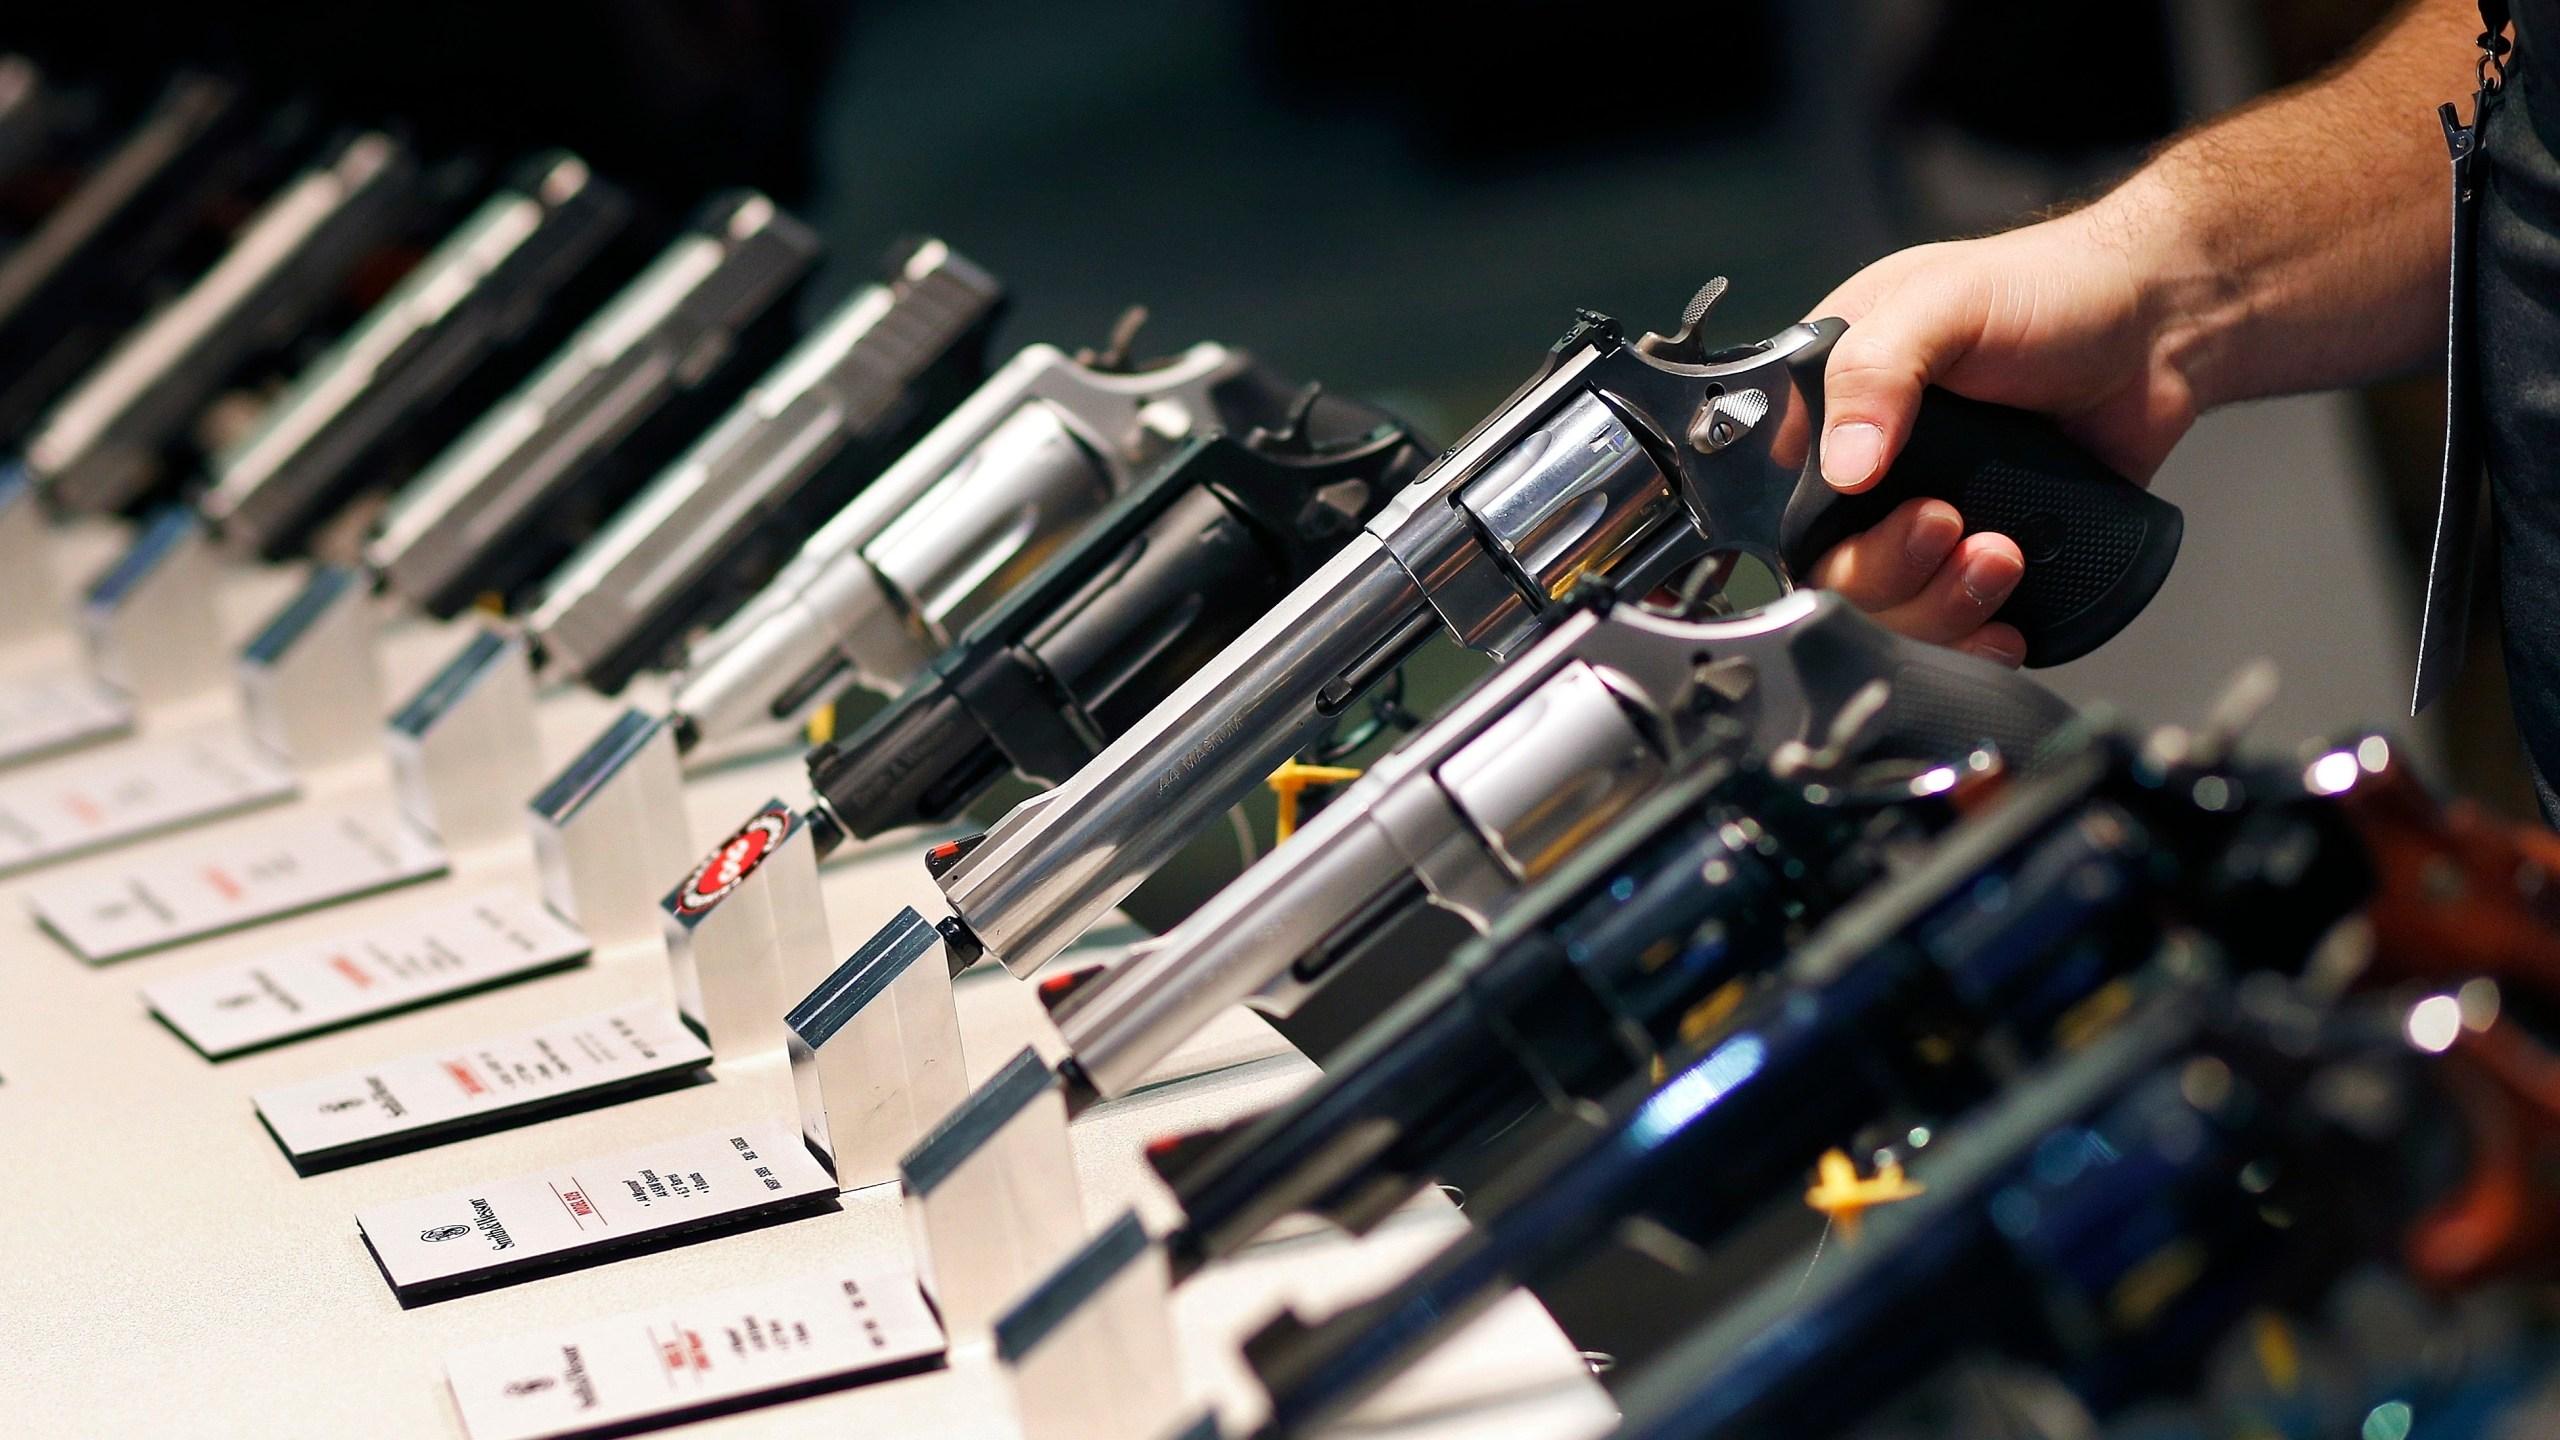 Gun_Industry_Tough_Times_26268-159532.jpg67926040